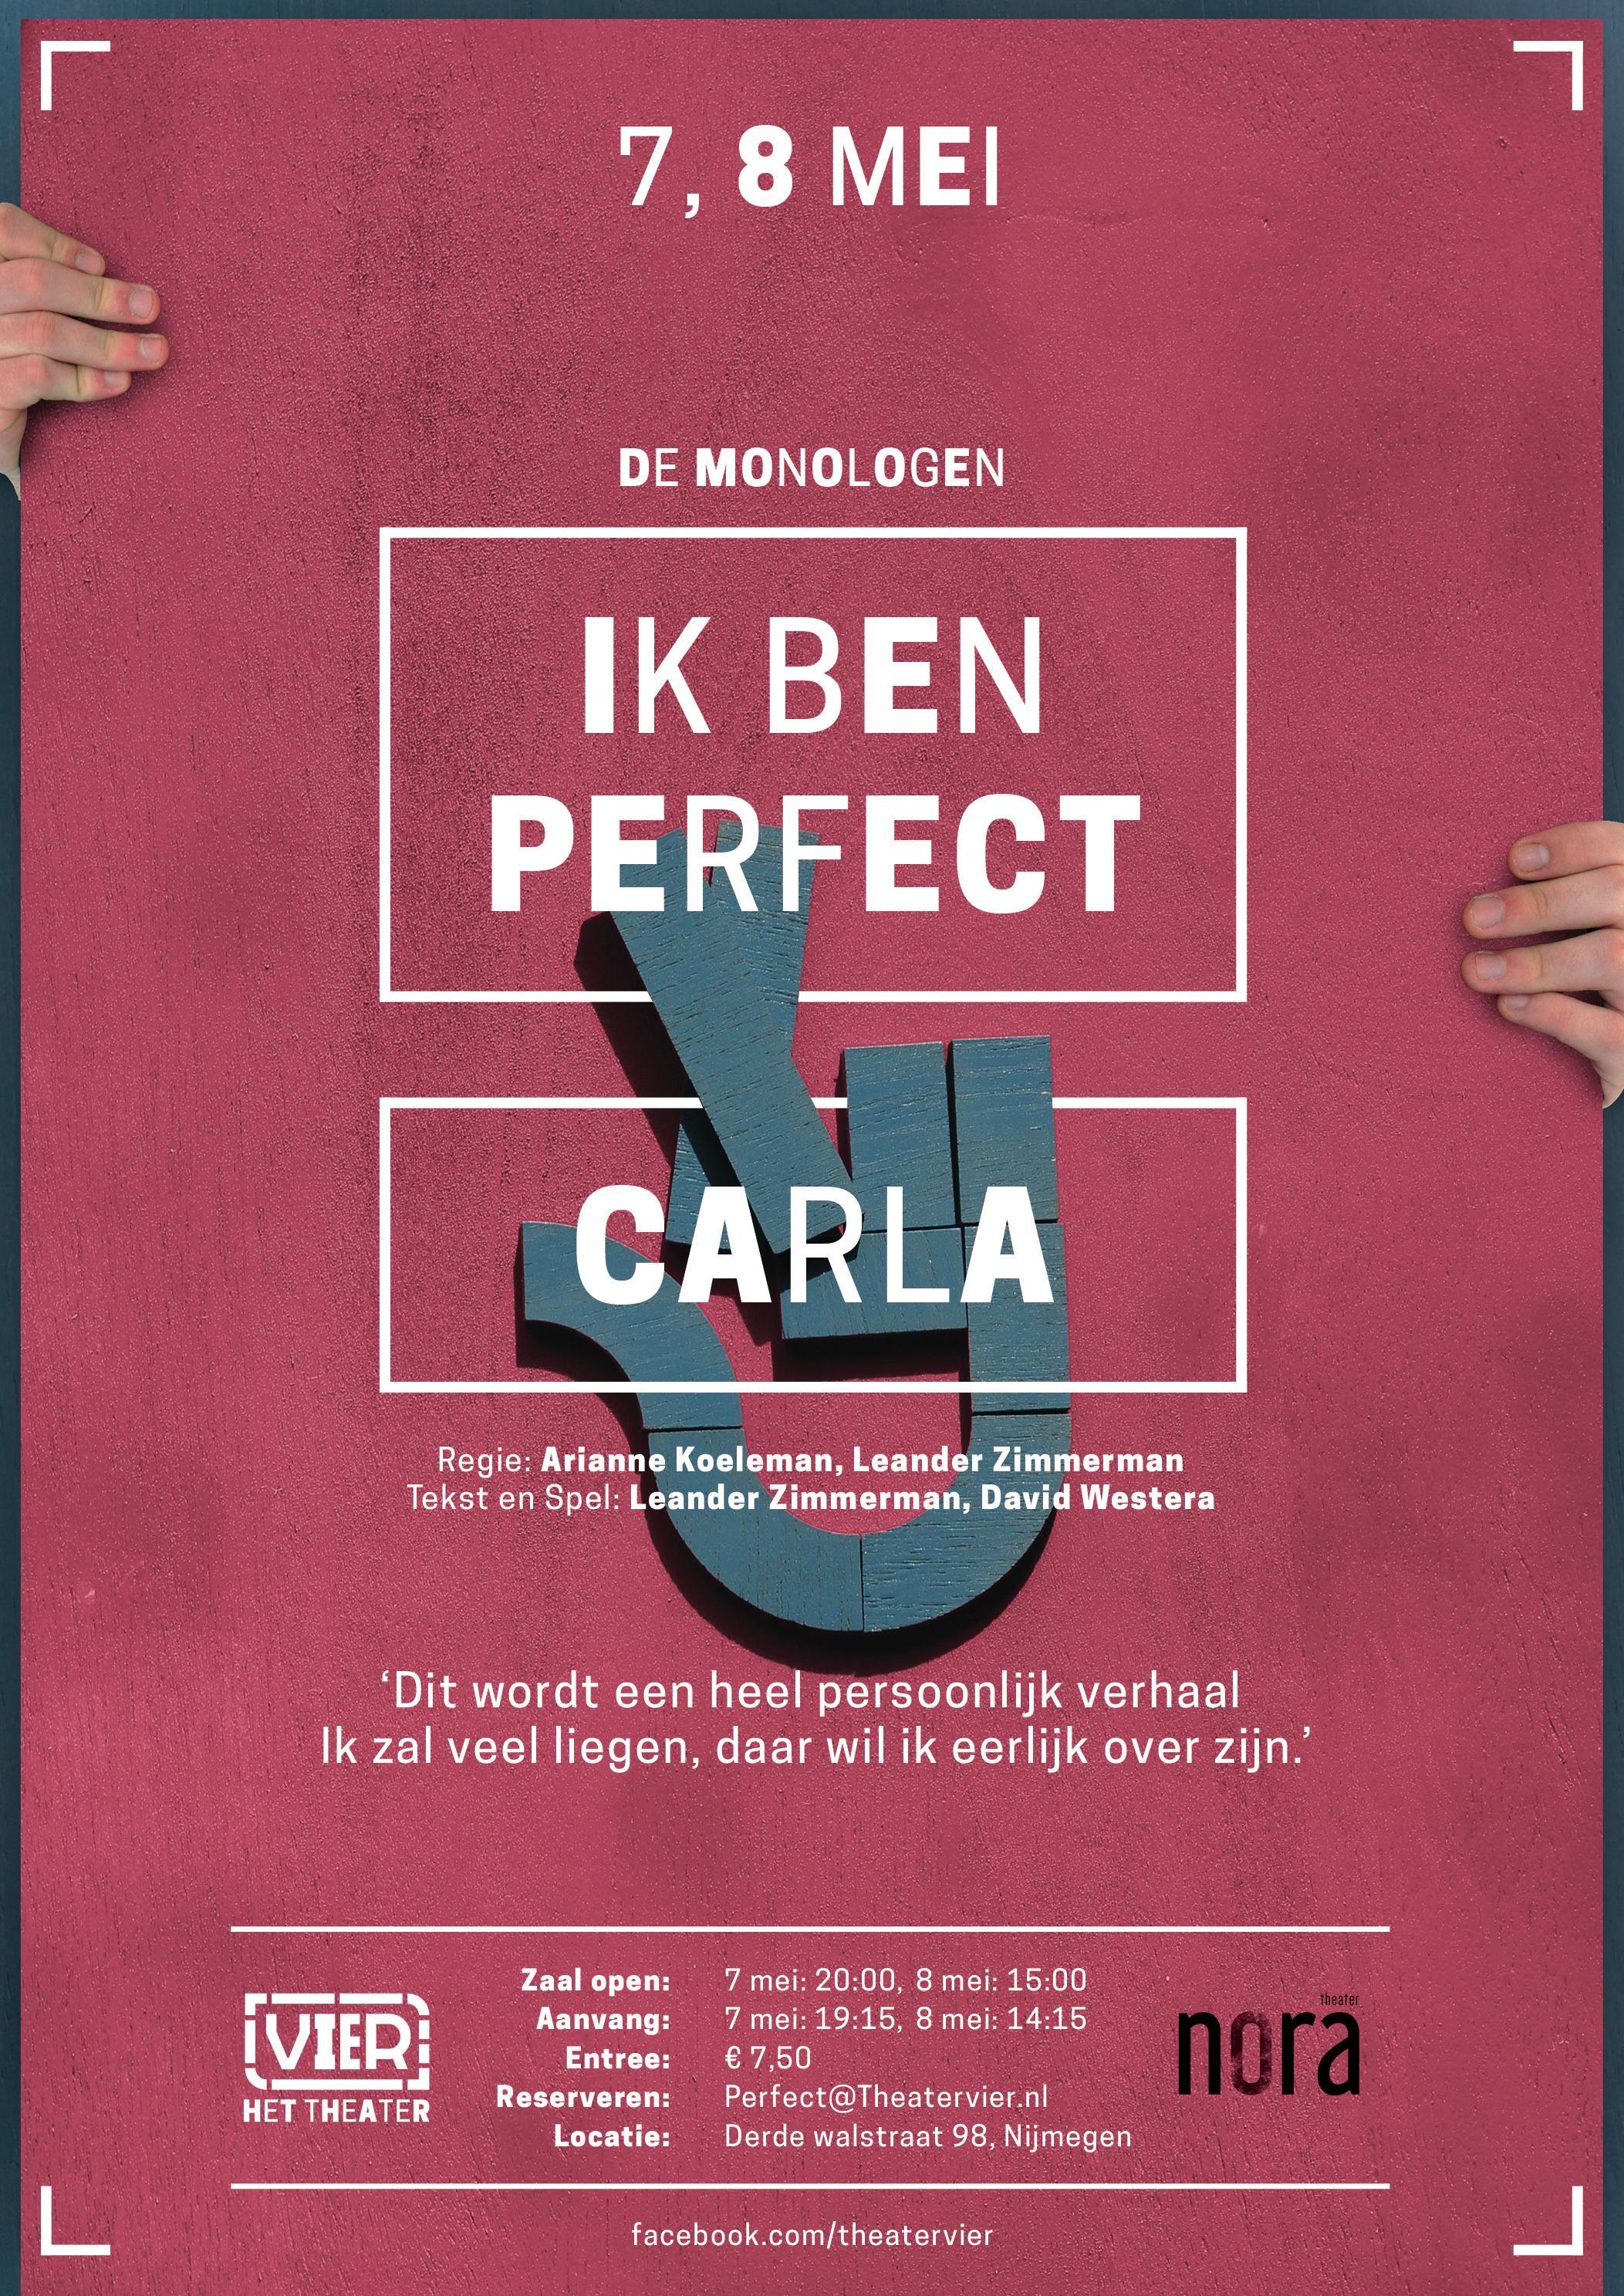 Poster 'VIER de monoloog #1'